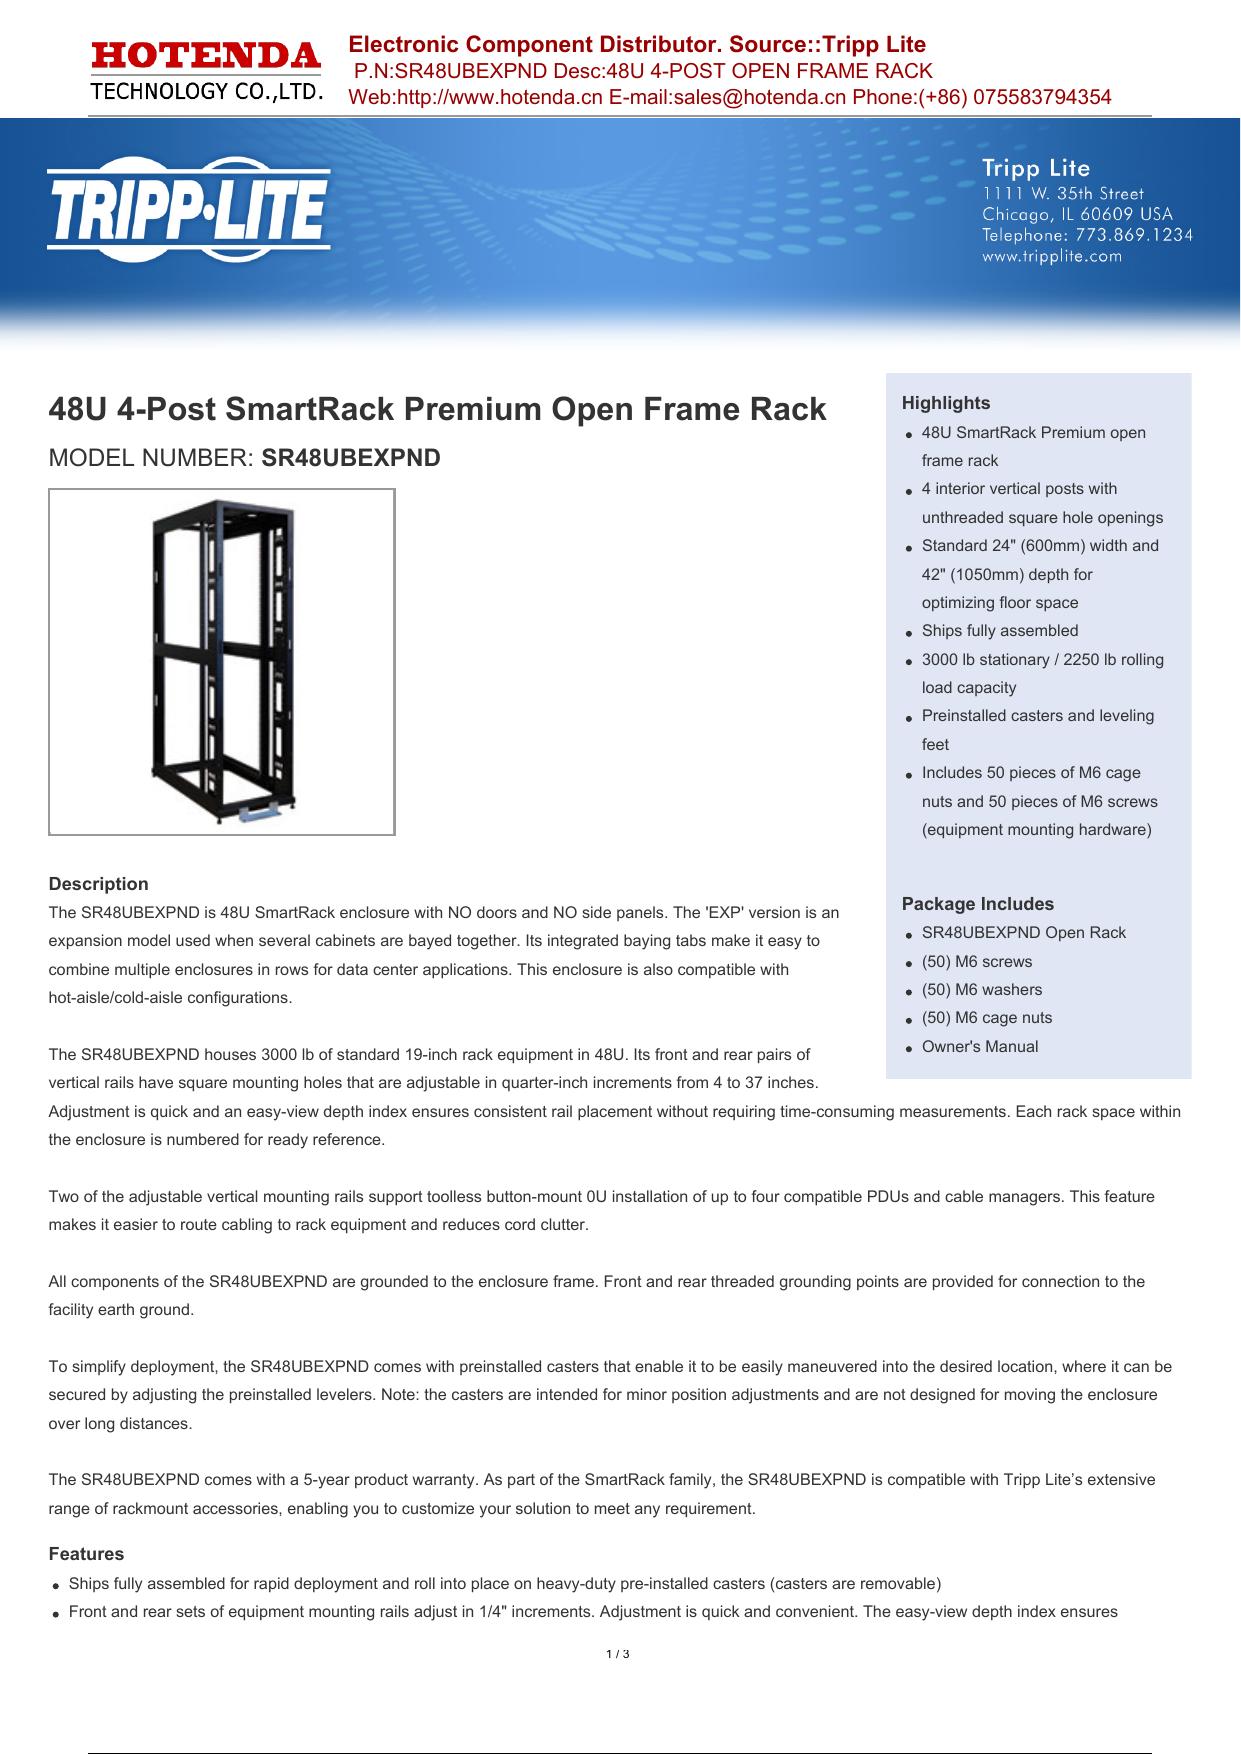 48U 4-Post SmartRack Premium Open Frame Rack   manualzz com